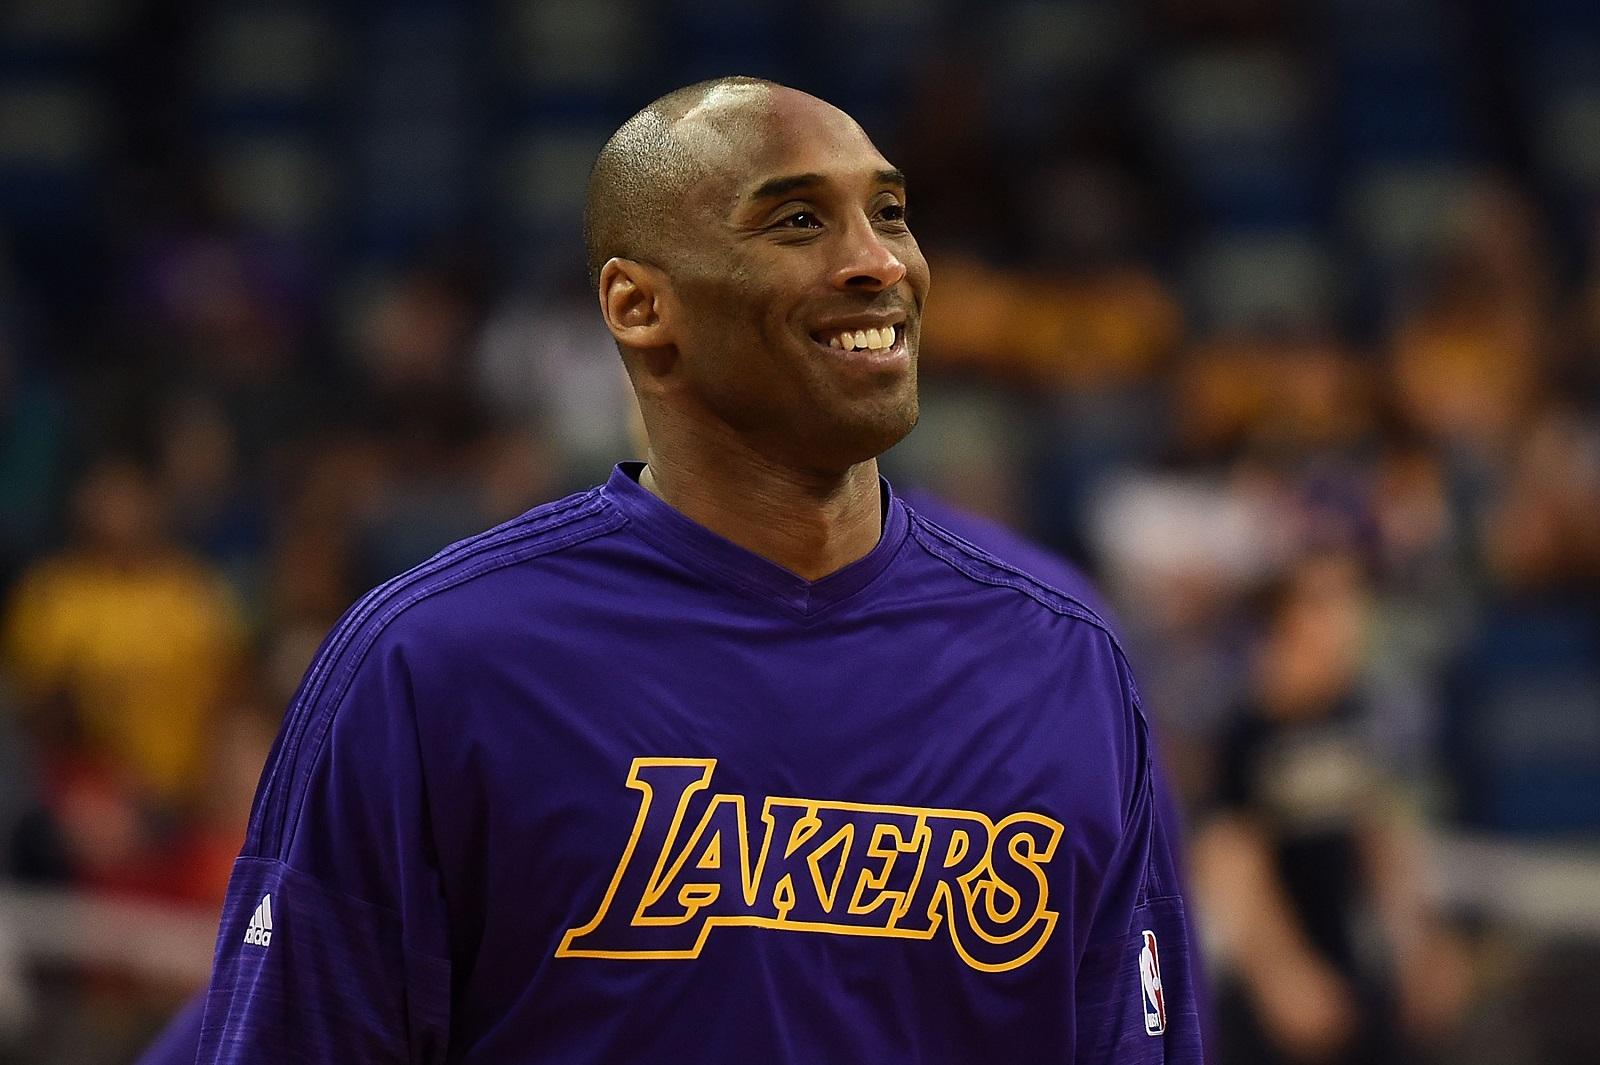 Former Lakers great Kobe Bryant